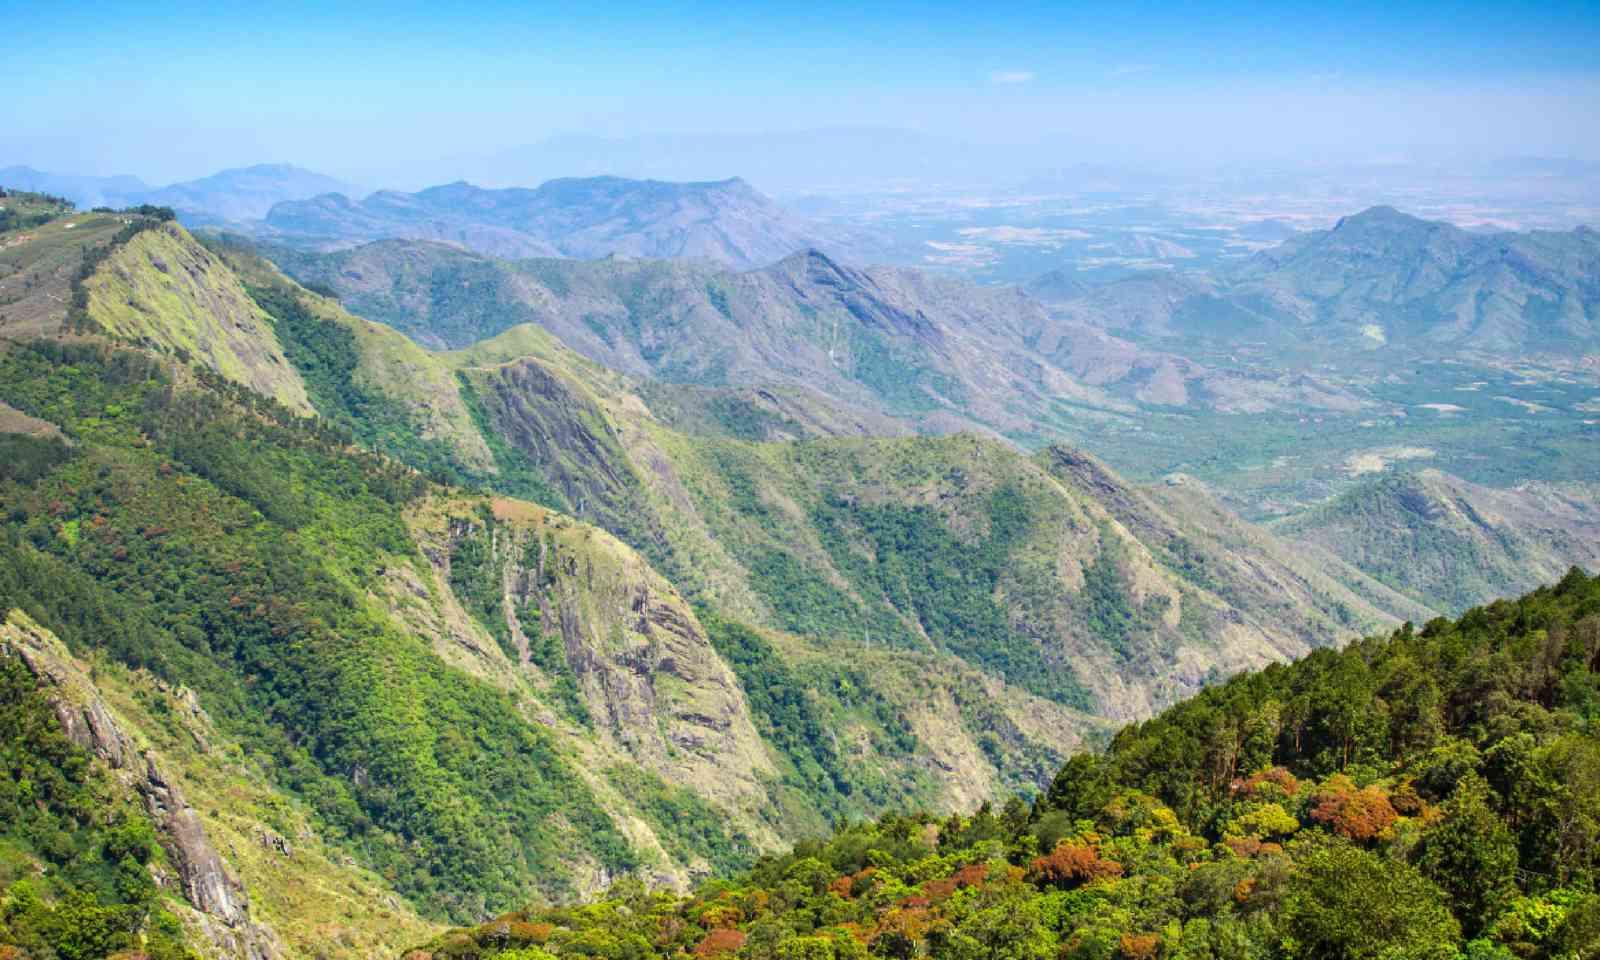 Kodaikanal, Tamil Nadu (Shutterstock)